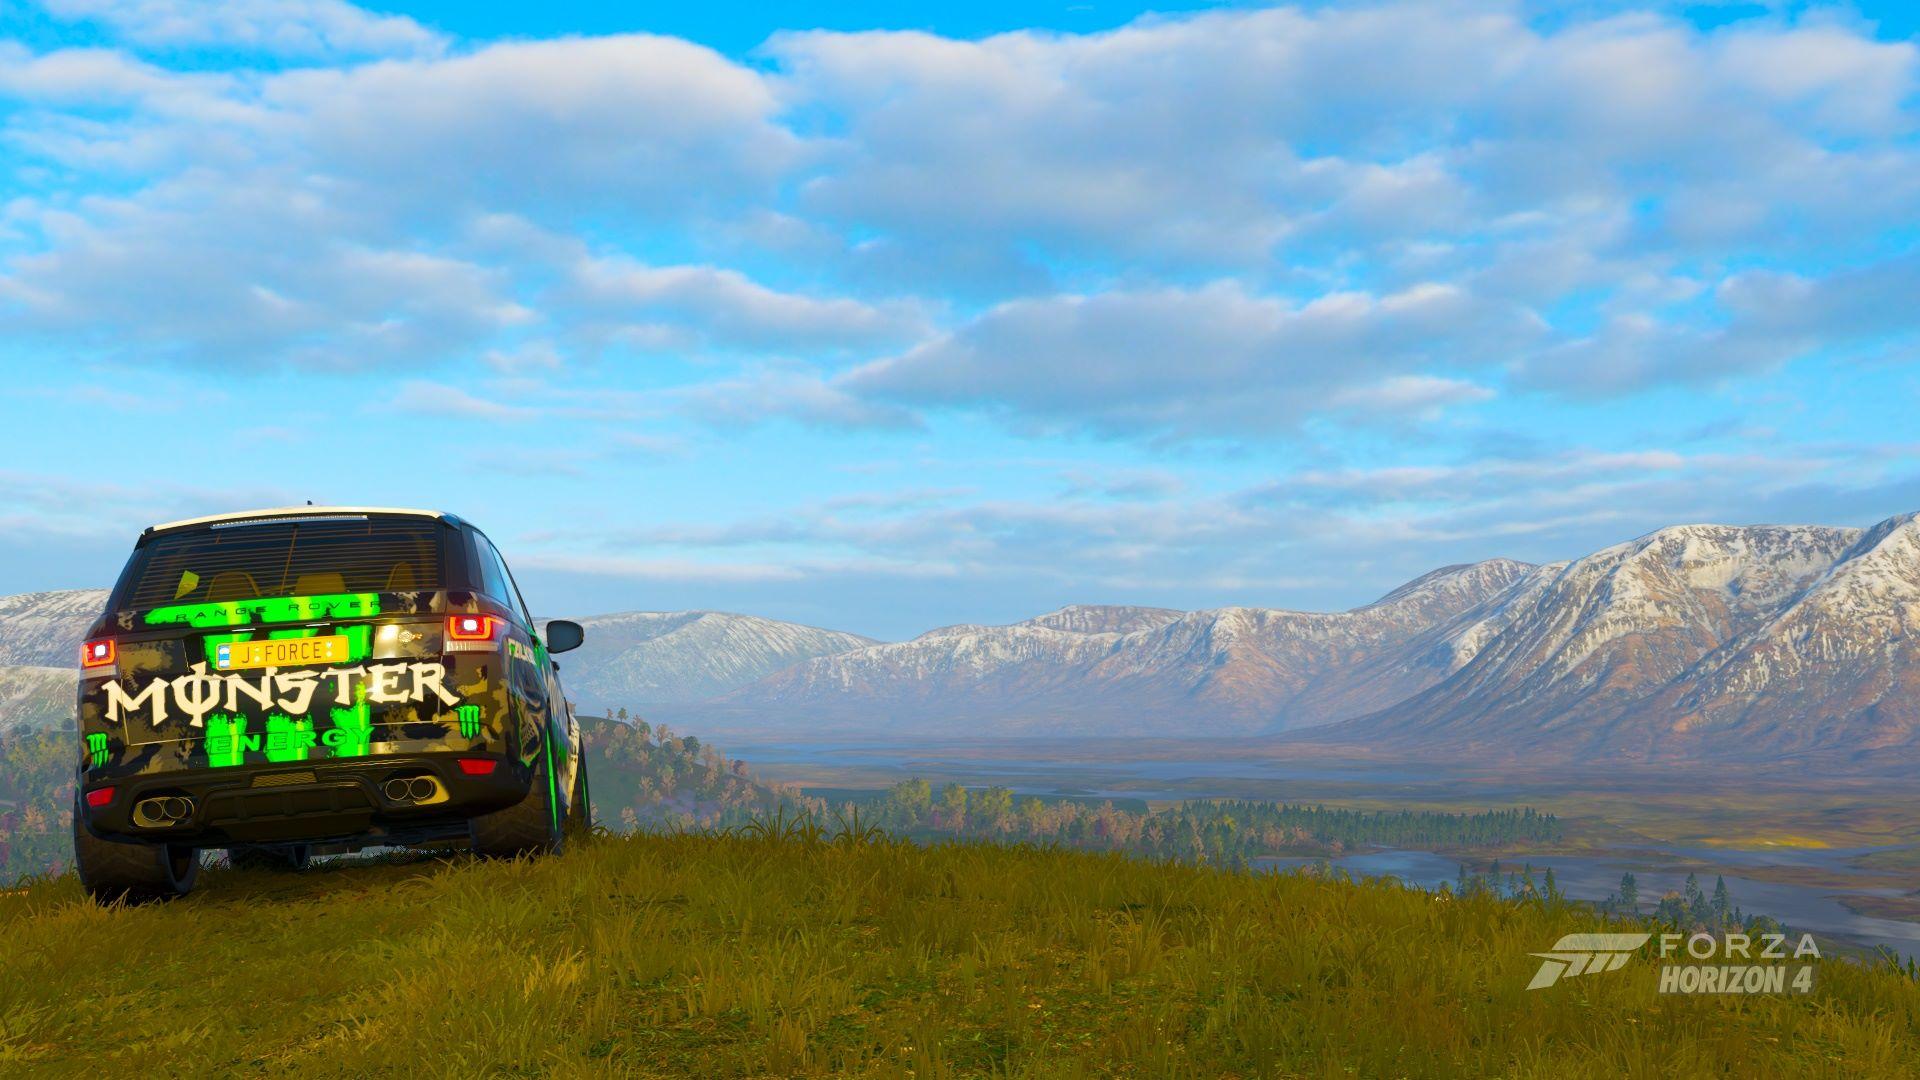 First look at Forza Horizon 4